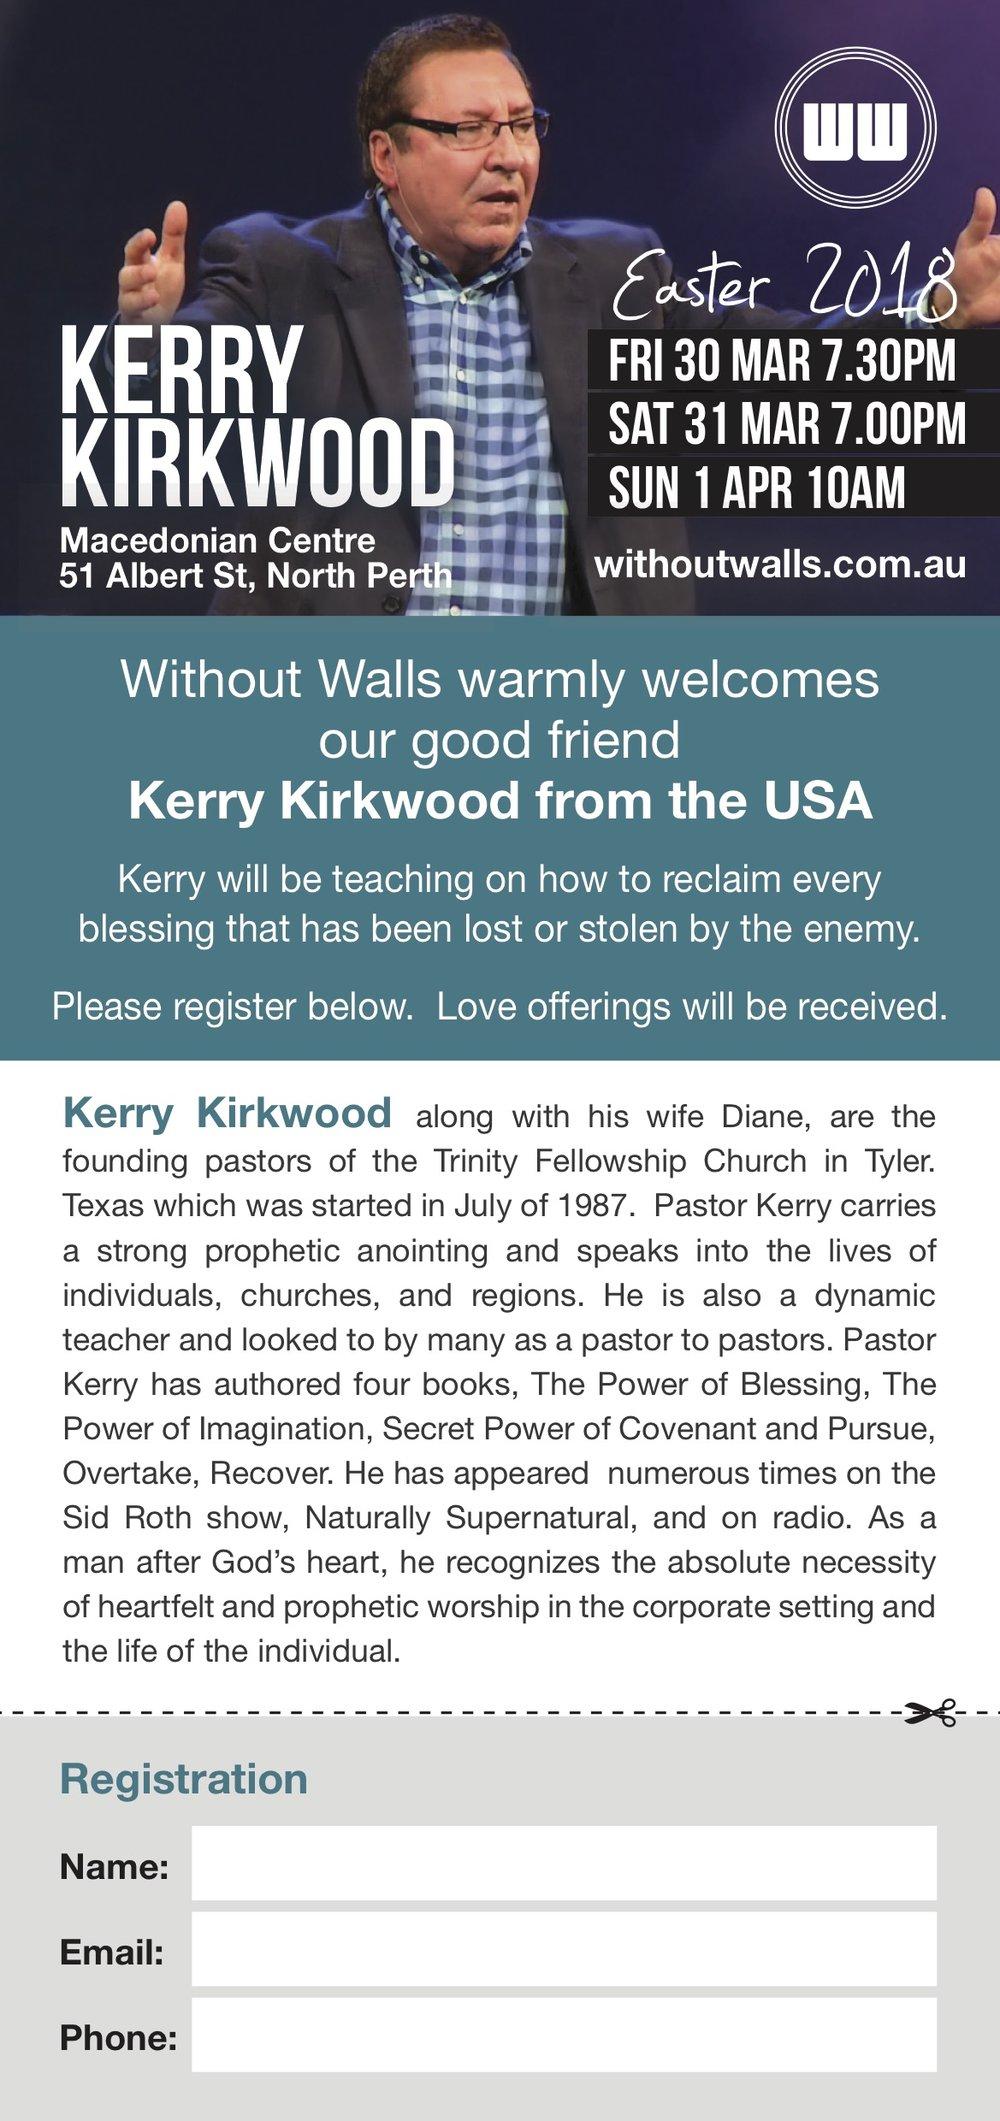 666_Kerry Kirkwood 2018 Flyer.jpg